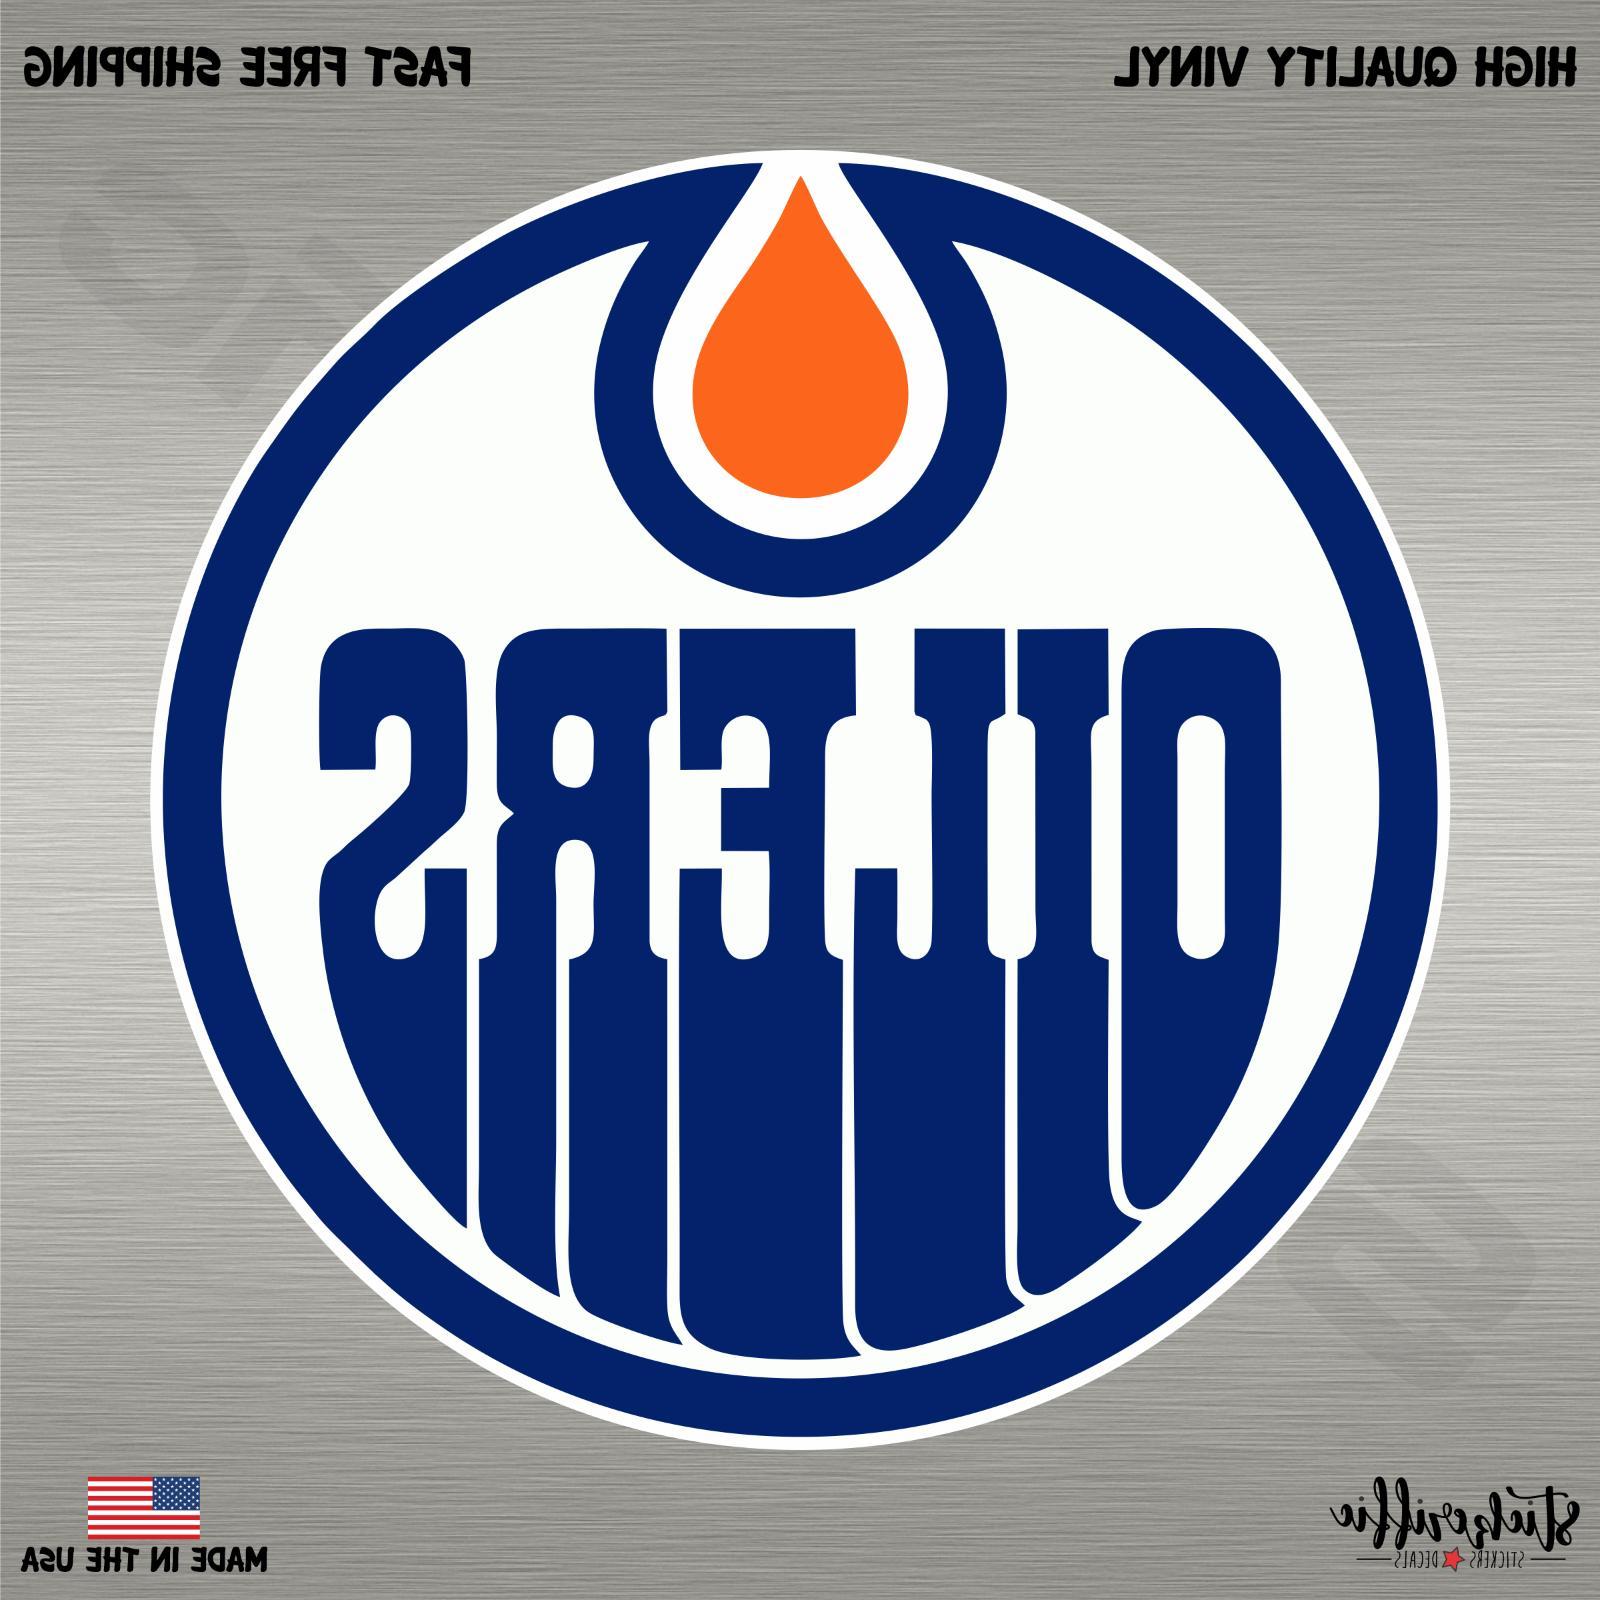 edmonton oilers nhl hockey full color logo